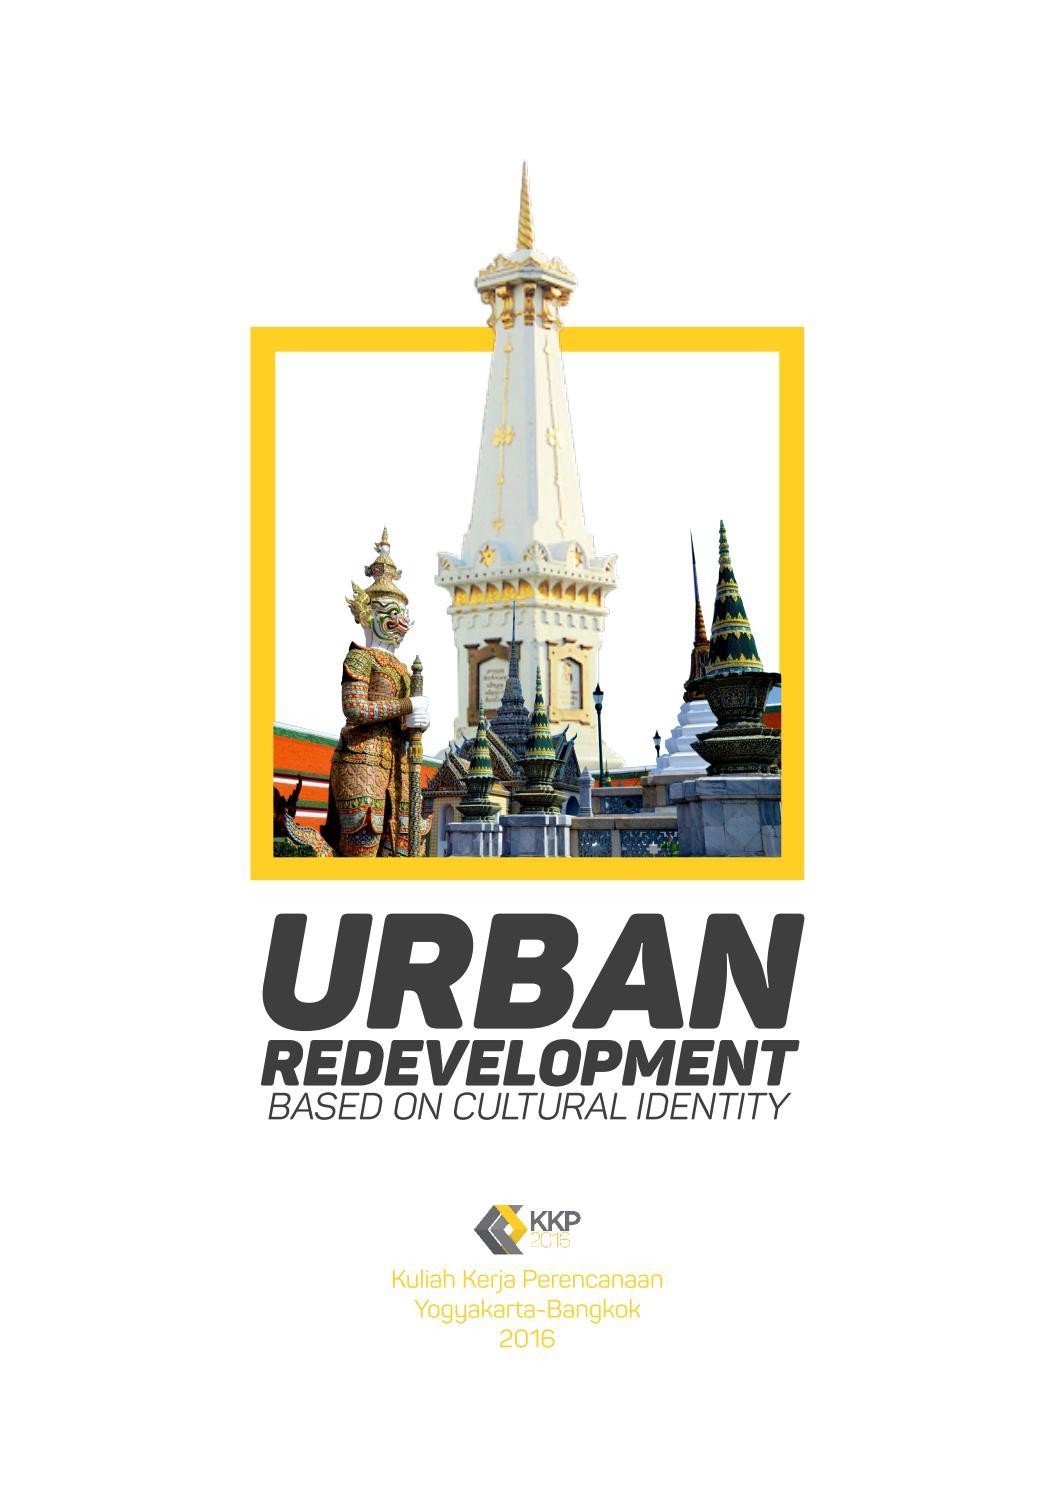 Laporan Kkp Pwk Ugm 2016 Urban Redevelopment Based On Cultural Identity By Mantjah Issuu